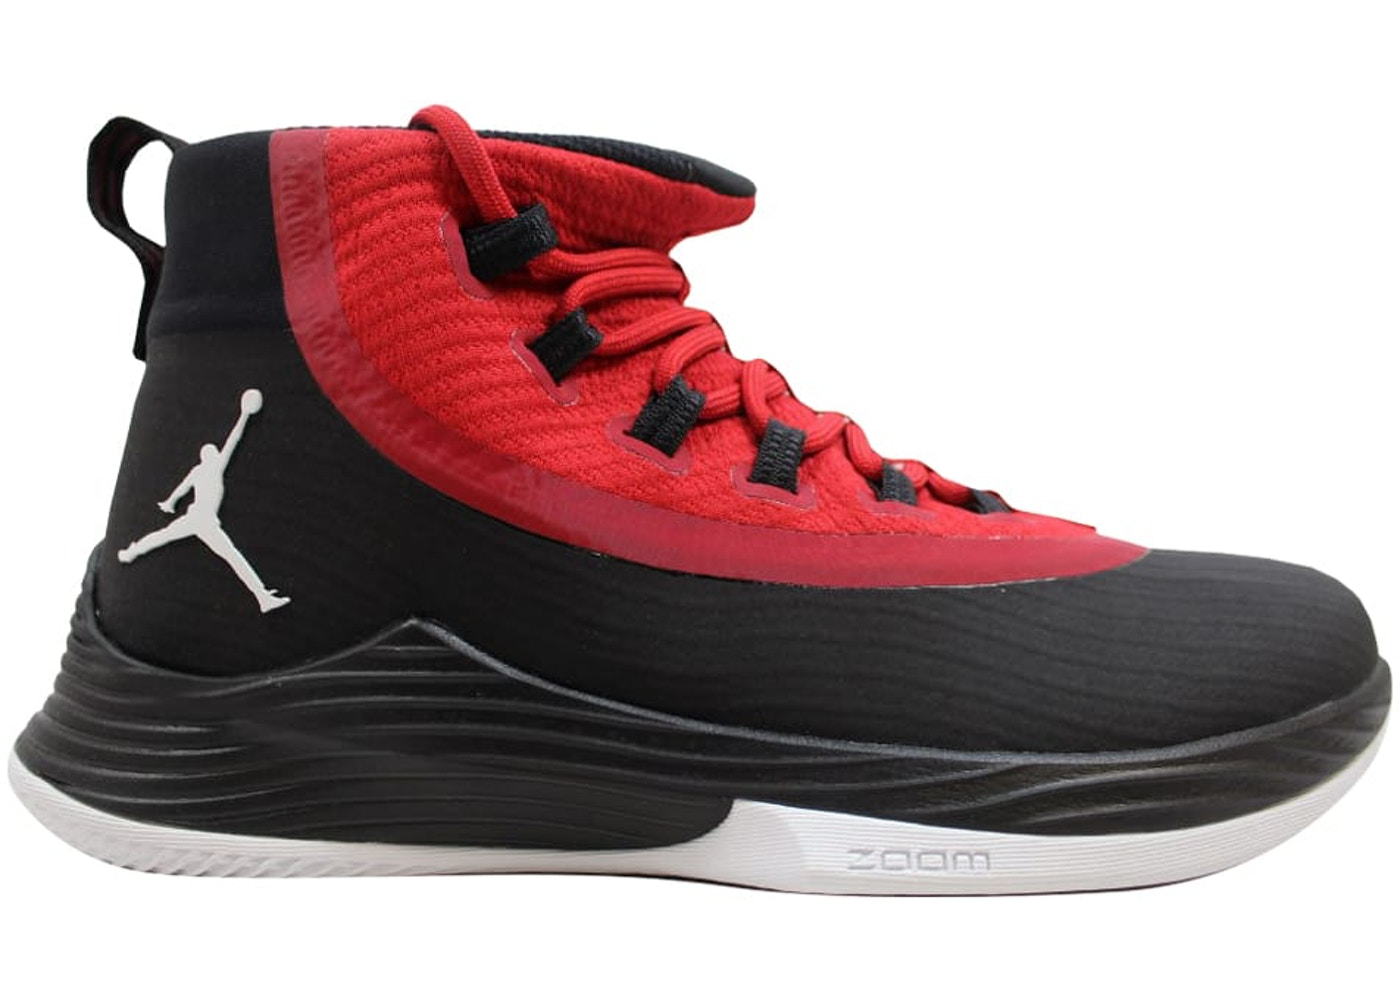 size 40 ca9ae 7fa29 Air Jordan Shoes - Volatility